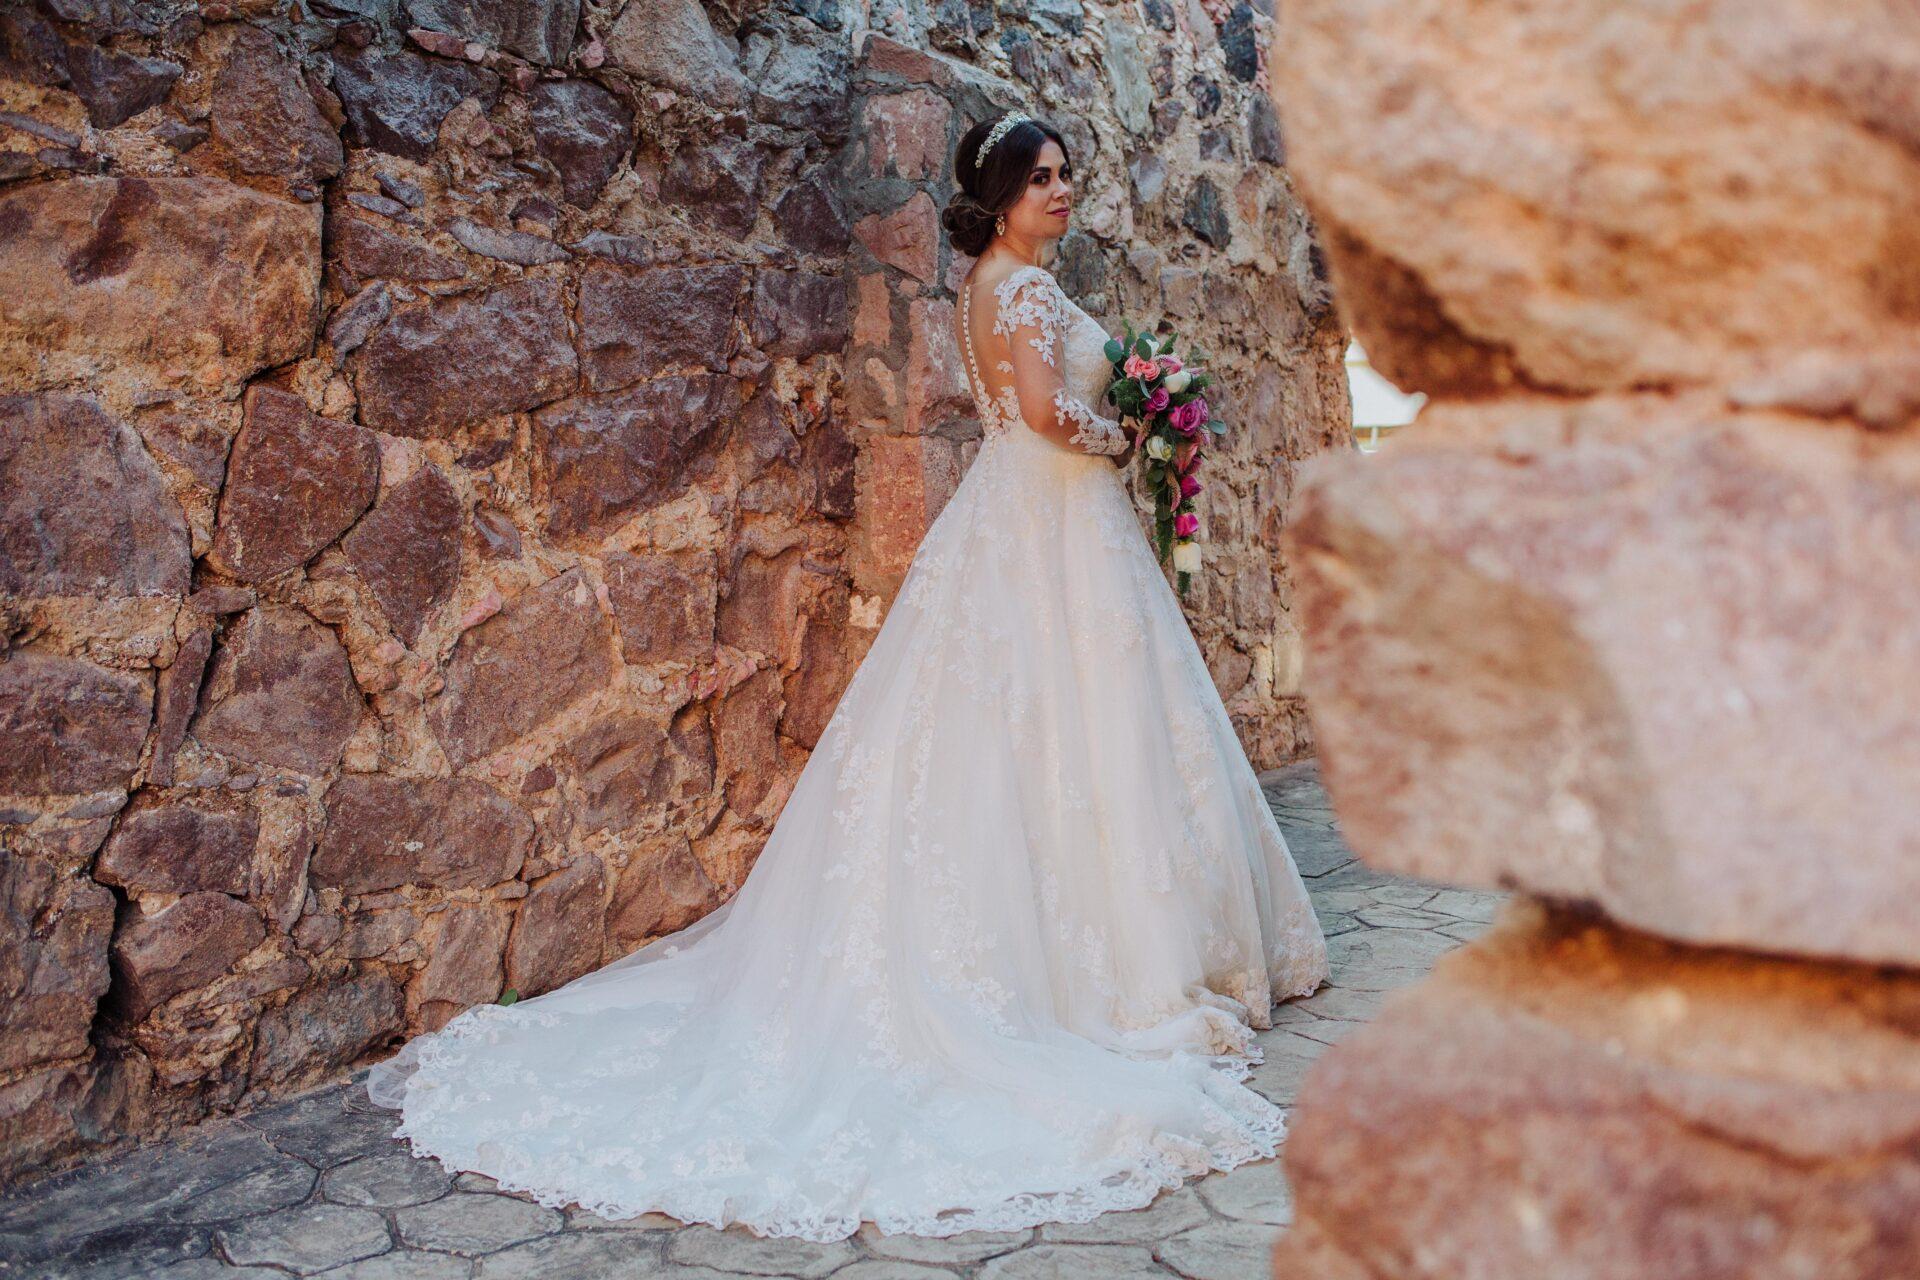 javier_noriega_fotografo_bodas_zacatecas_fresnillo_chihuahua_wedding_photographer10